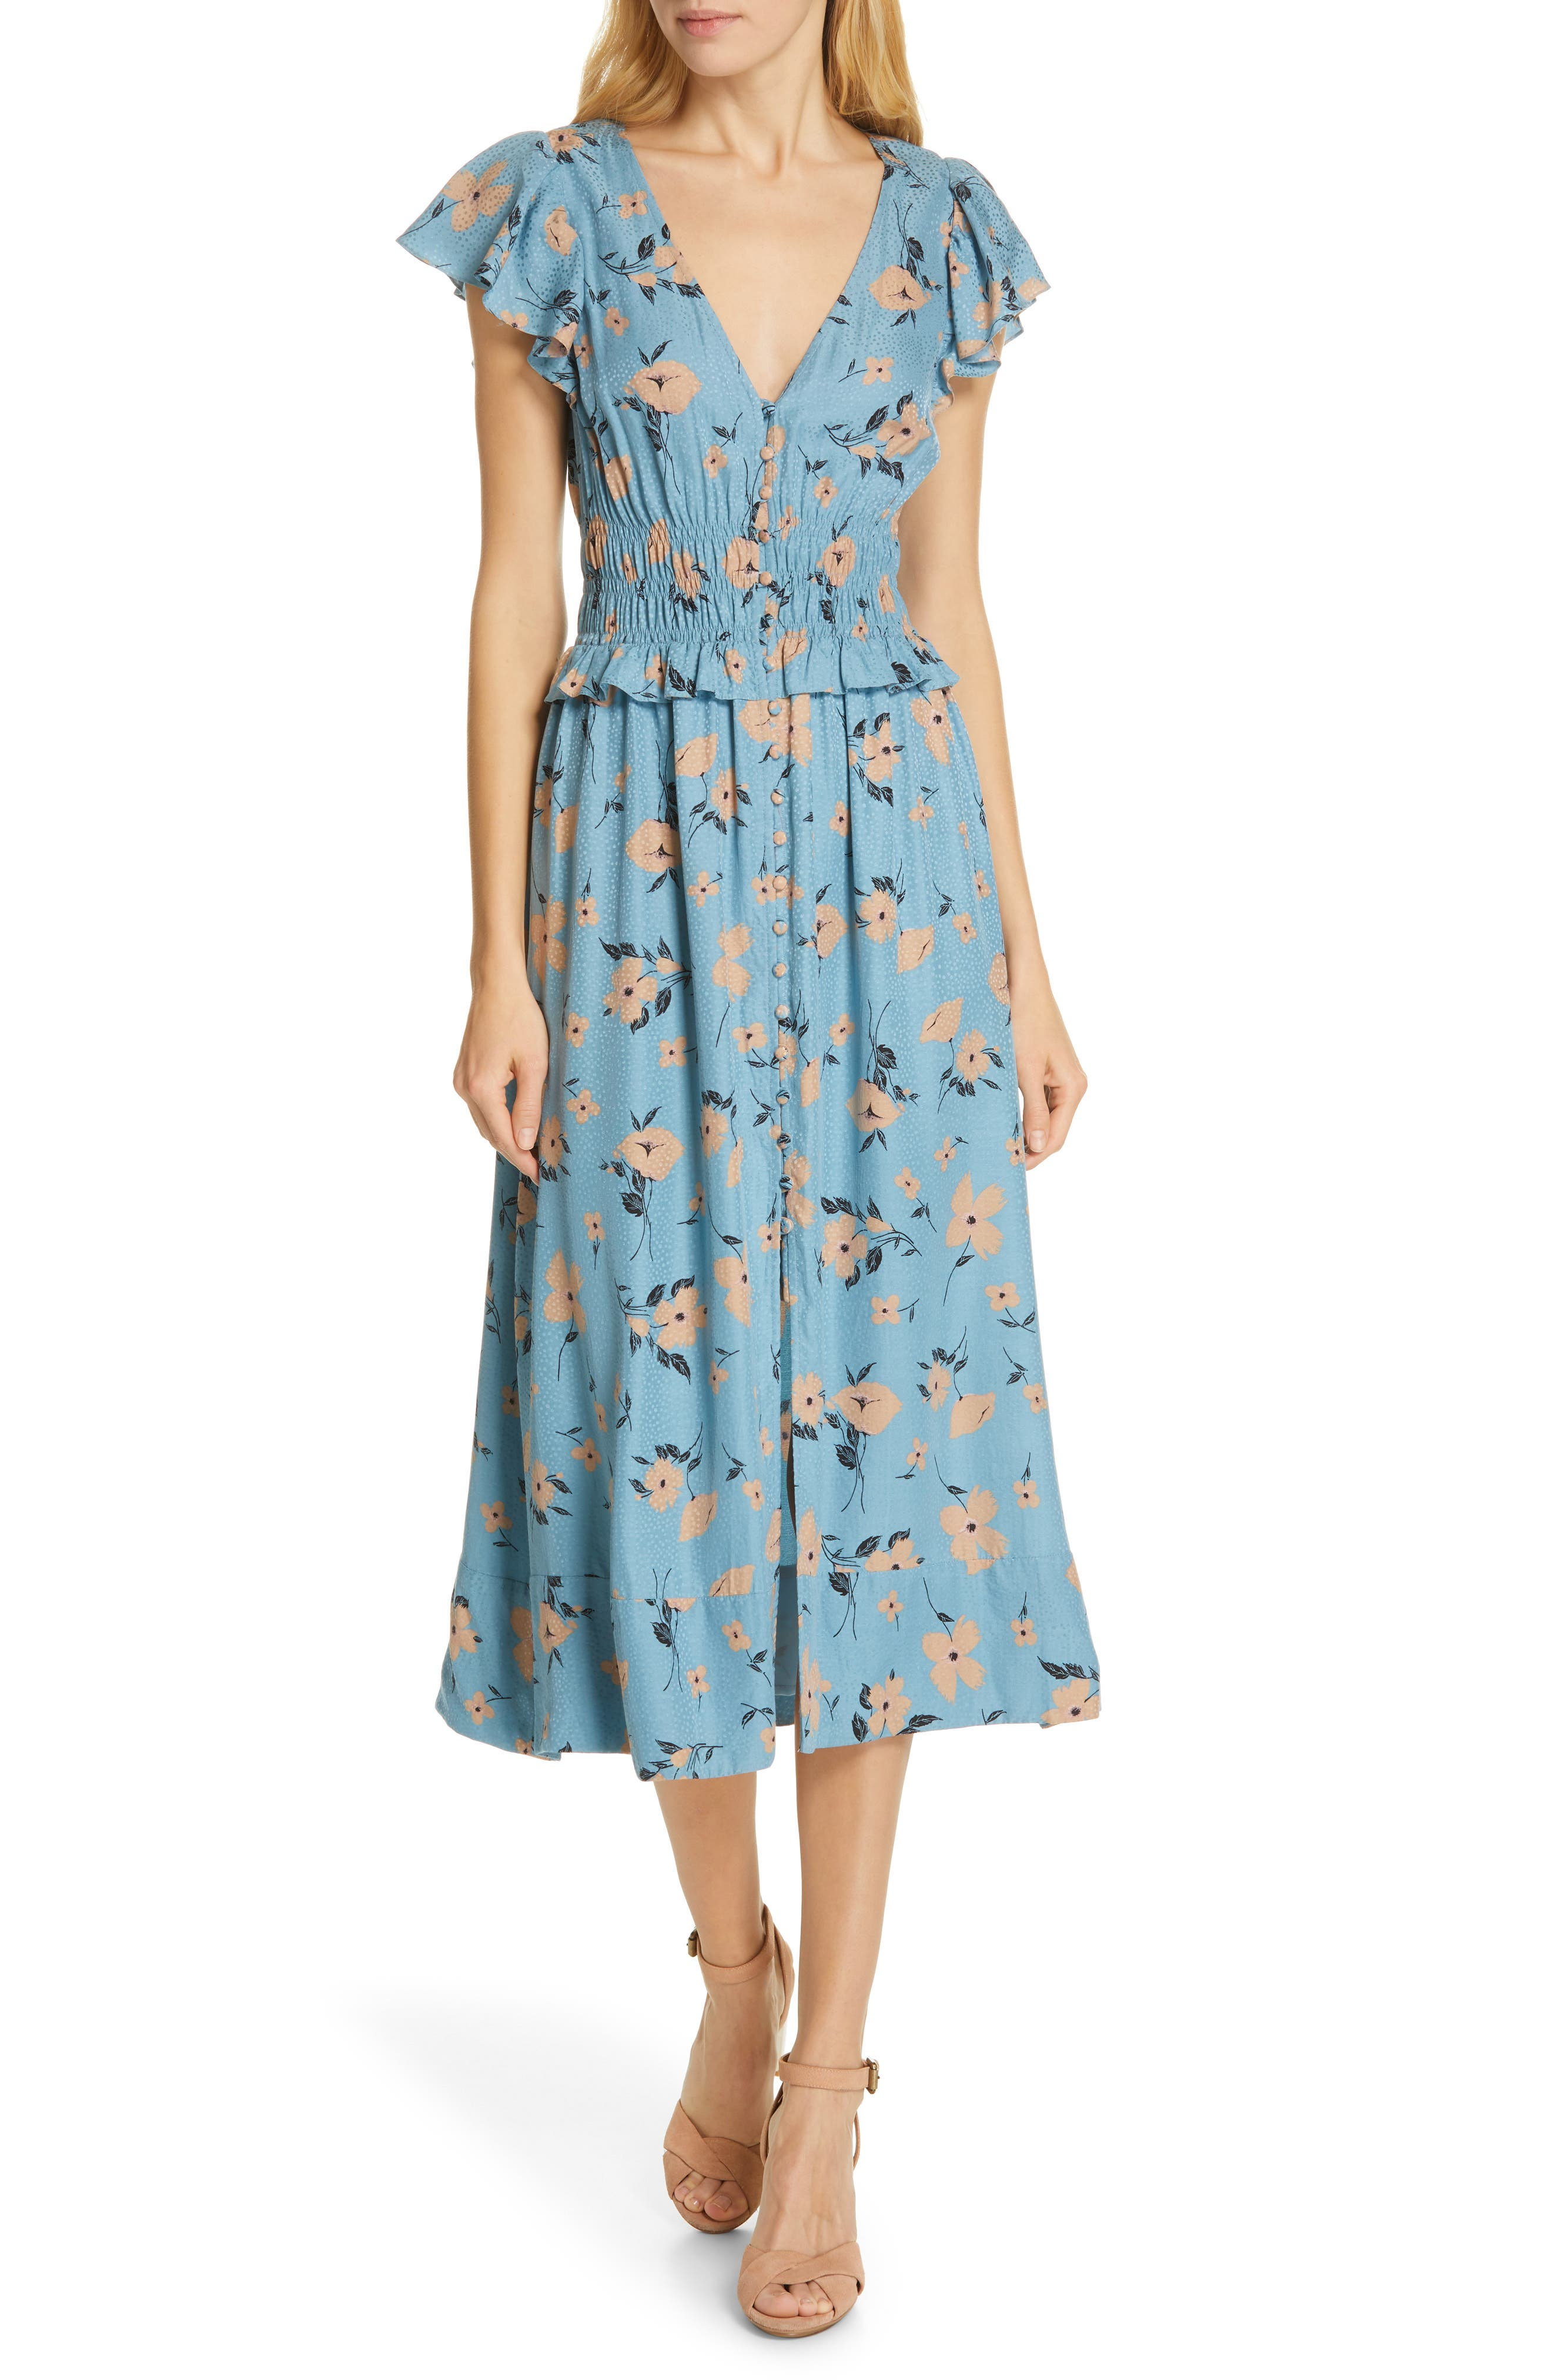 REBECCA TAYLOR Daniella Floral Jacquard Silk Blend Dress, Main, color, LAGOON COMBO